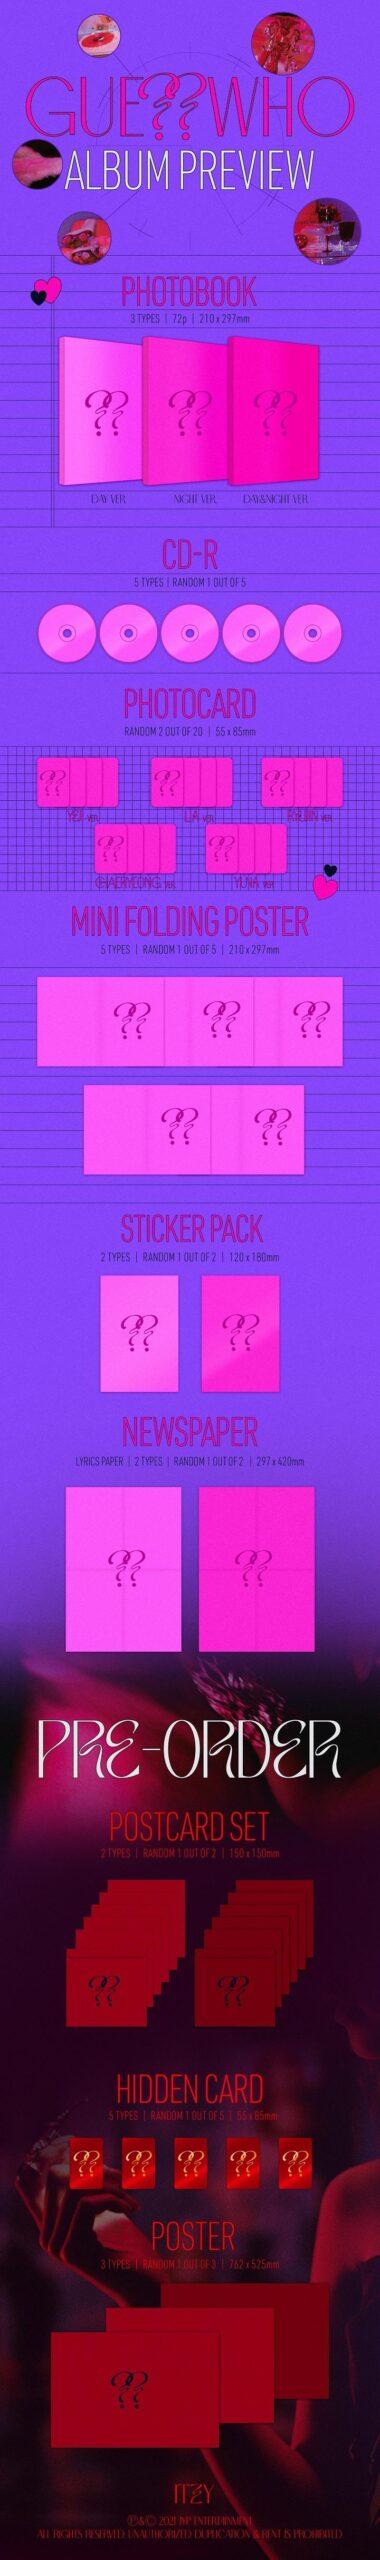 ITZY Album GUESS WHO Random Ver. Poster